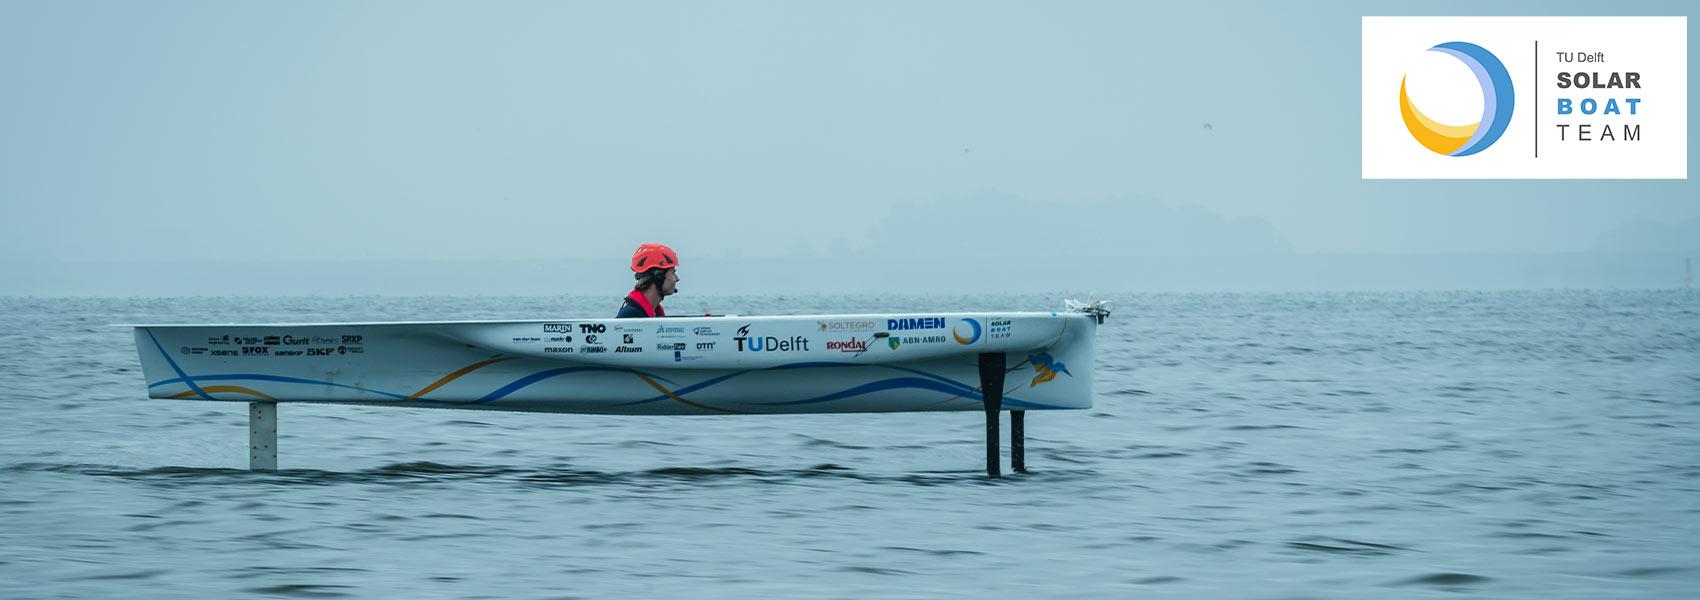 TU Delft Solar Boat Team-2020